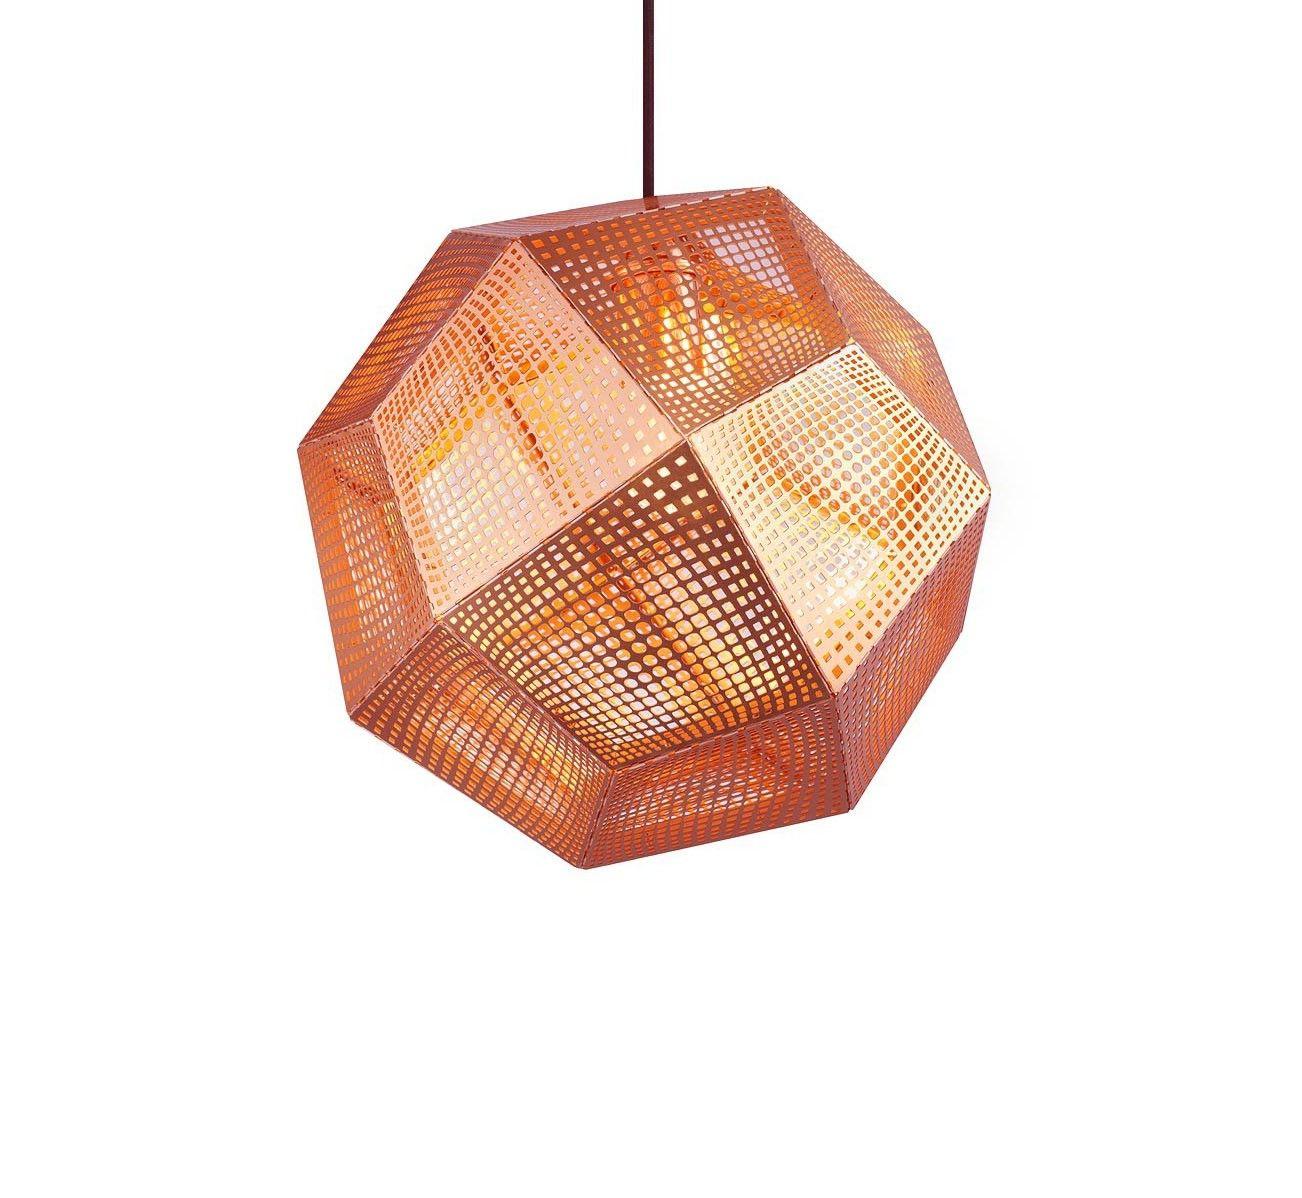 Tom dixon mid copper etch pendant light etch pendants are inspired